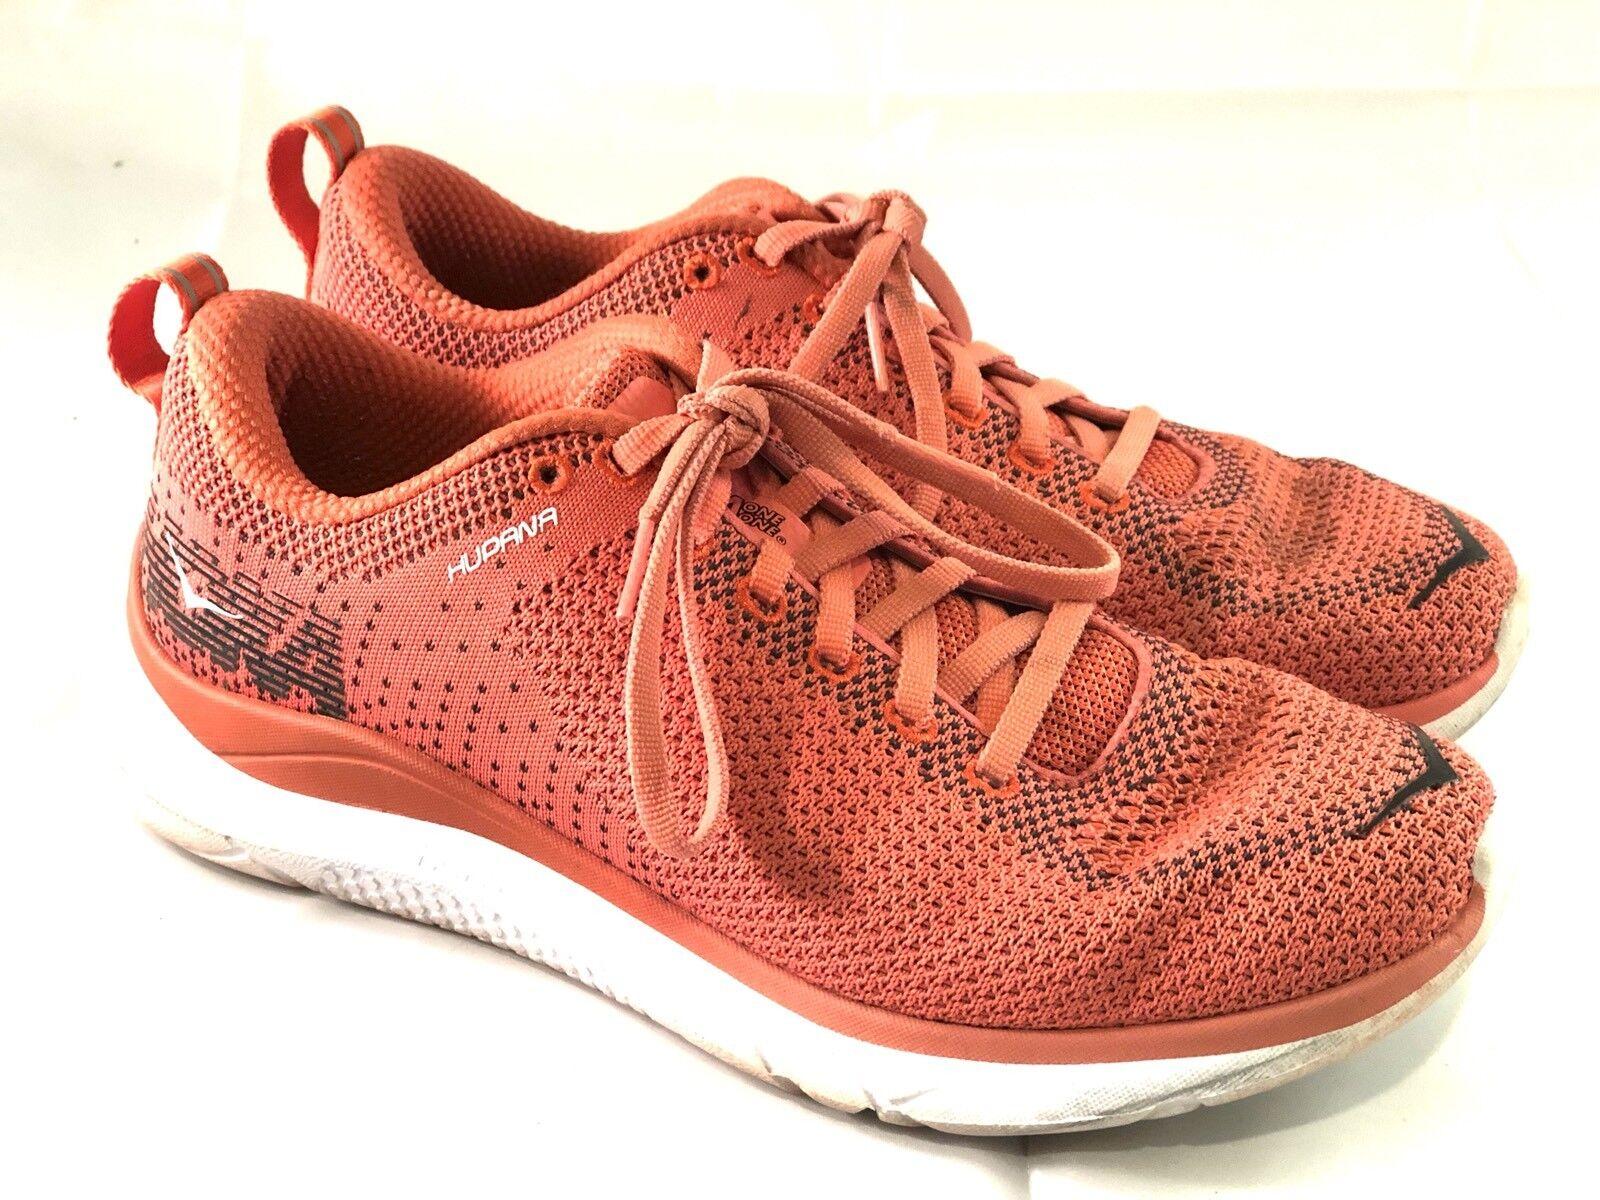 Hoka One One - Hupana 2 Running Schuhe - One Damenschuhe Größe 8.5 US Dubarry/Grenadine a6386c